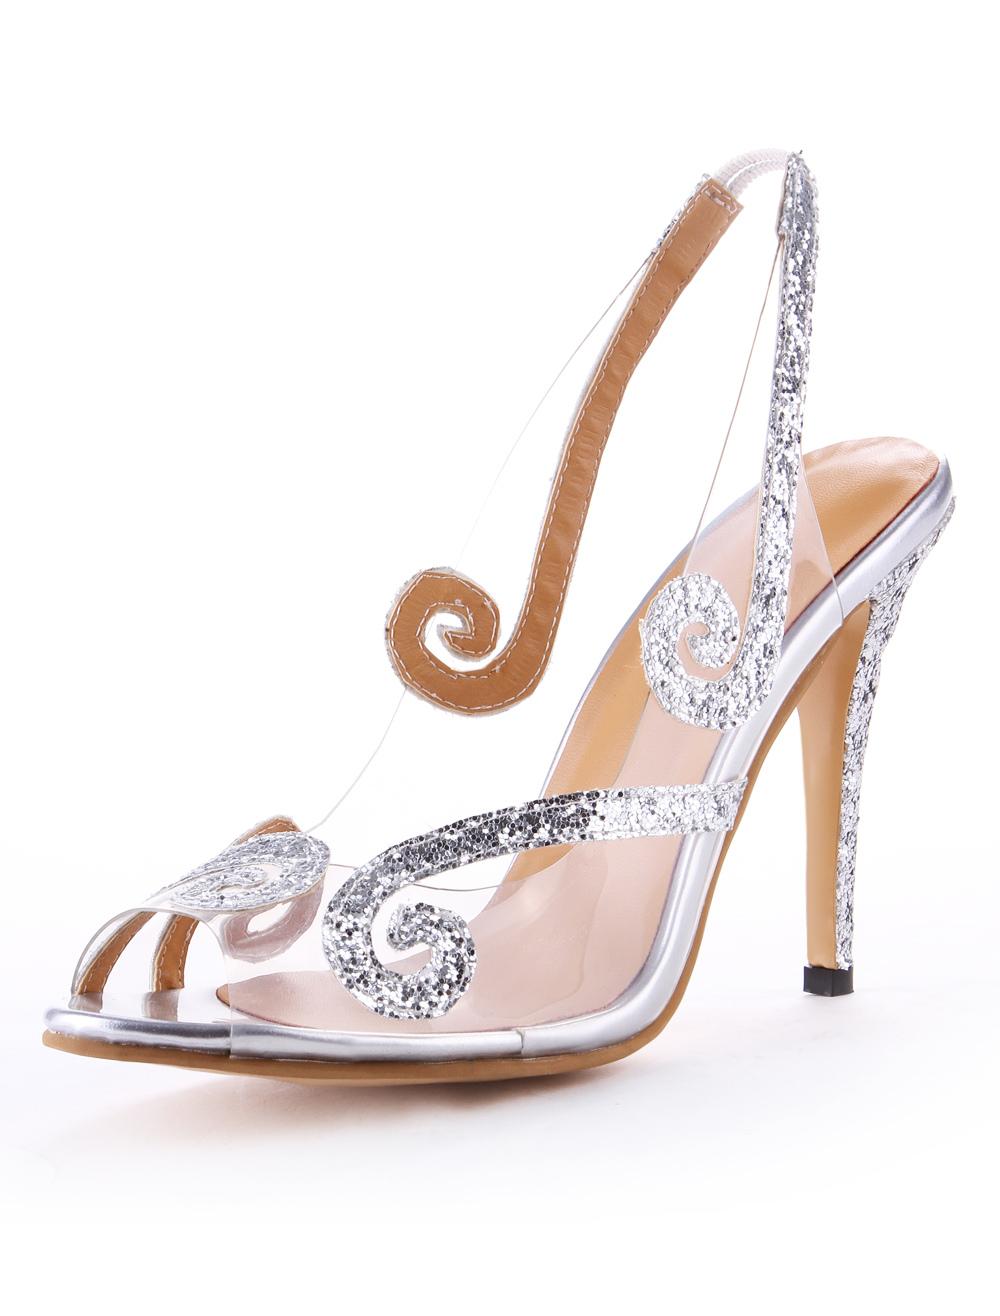 Women Dress Shoes High Heel Sandals Glitter Peep Toe Slingbacks Wedding Shoes